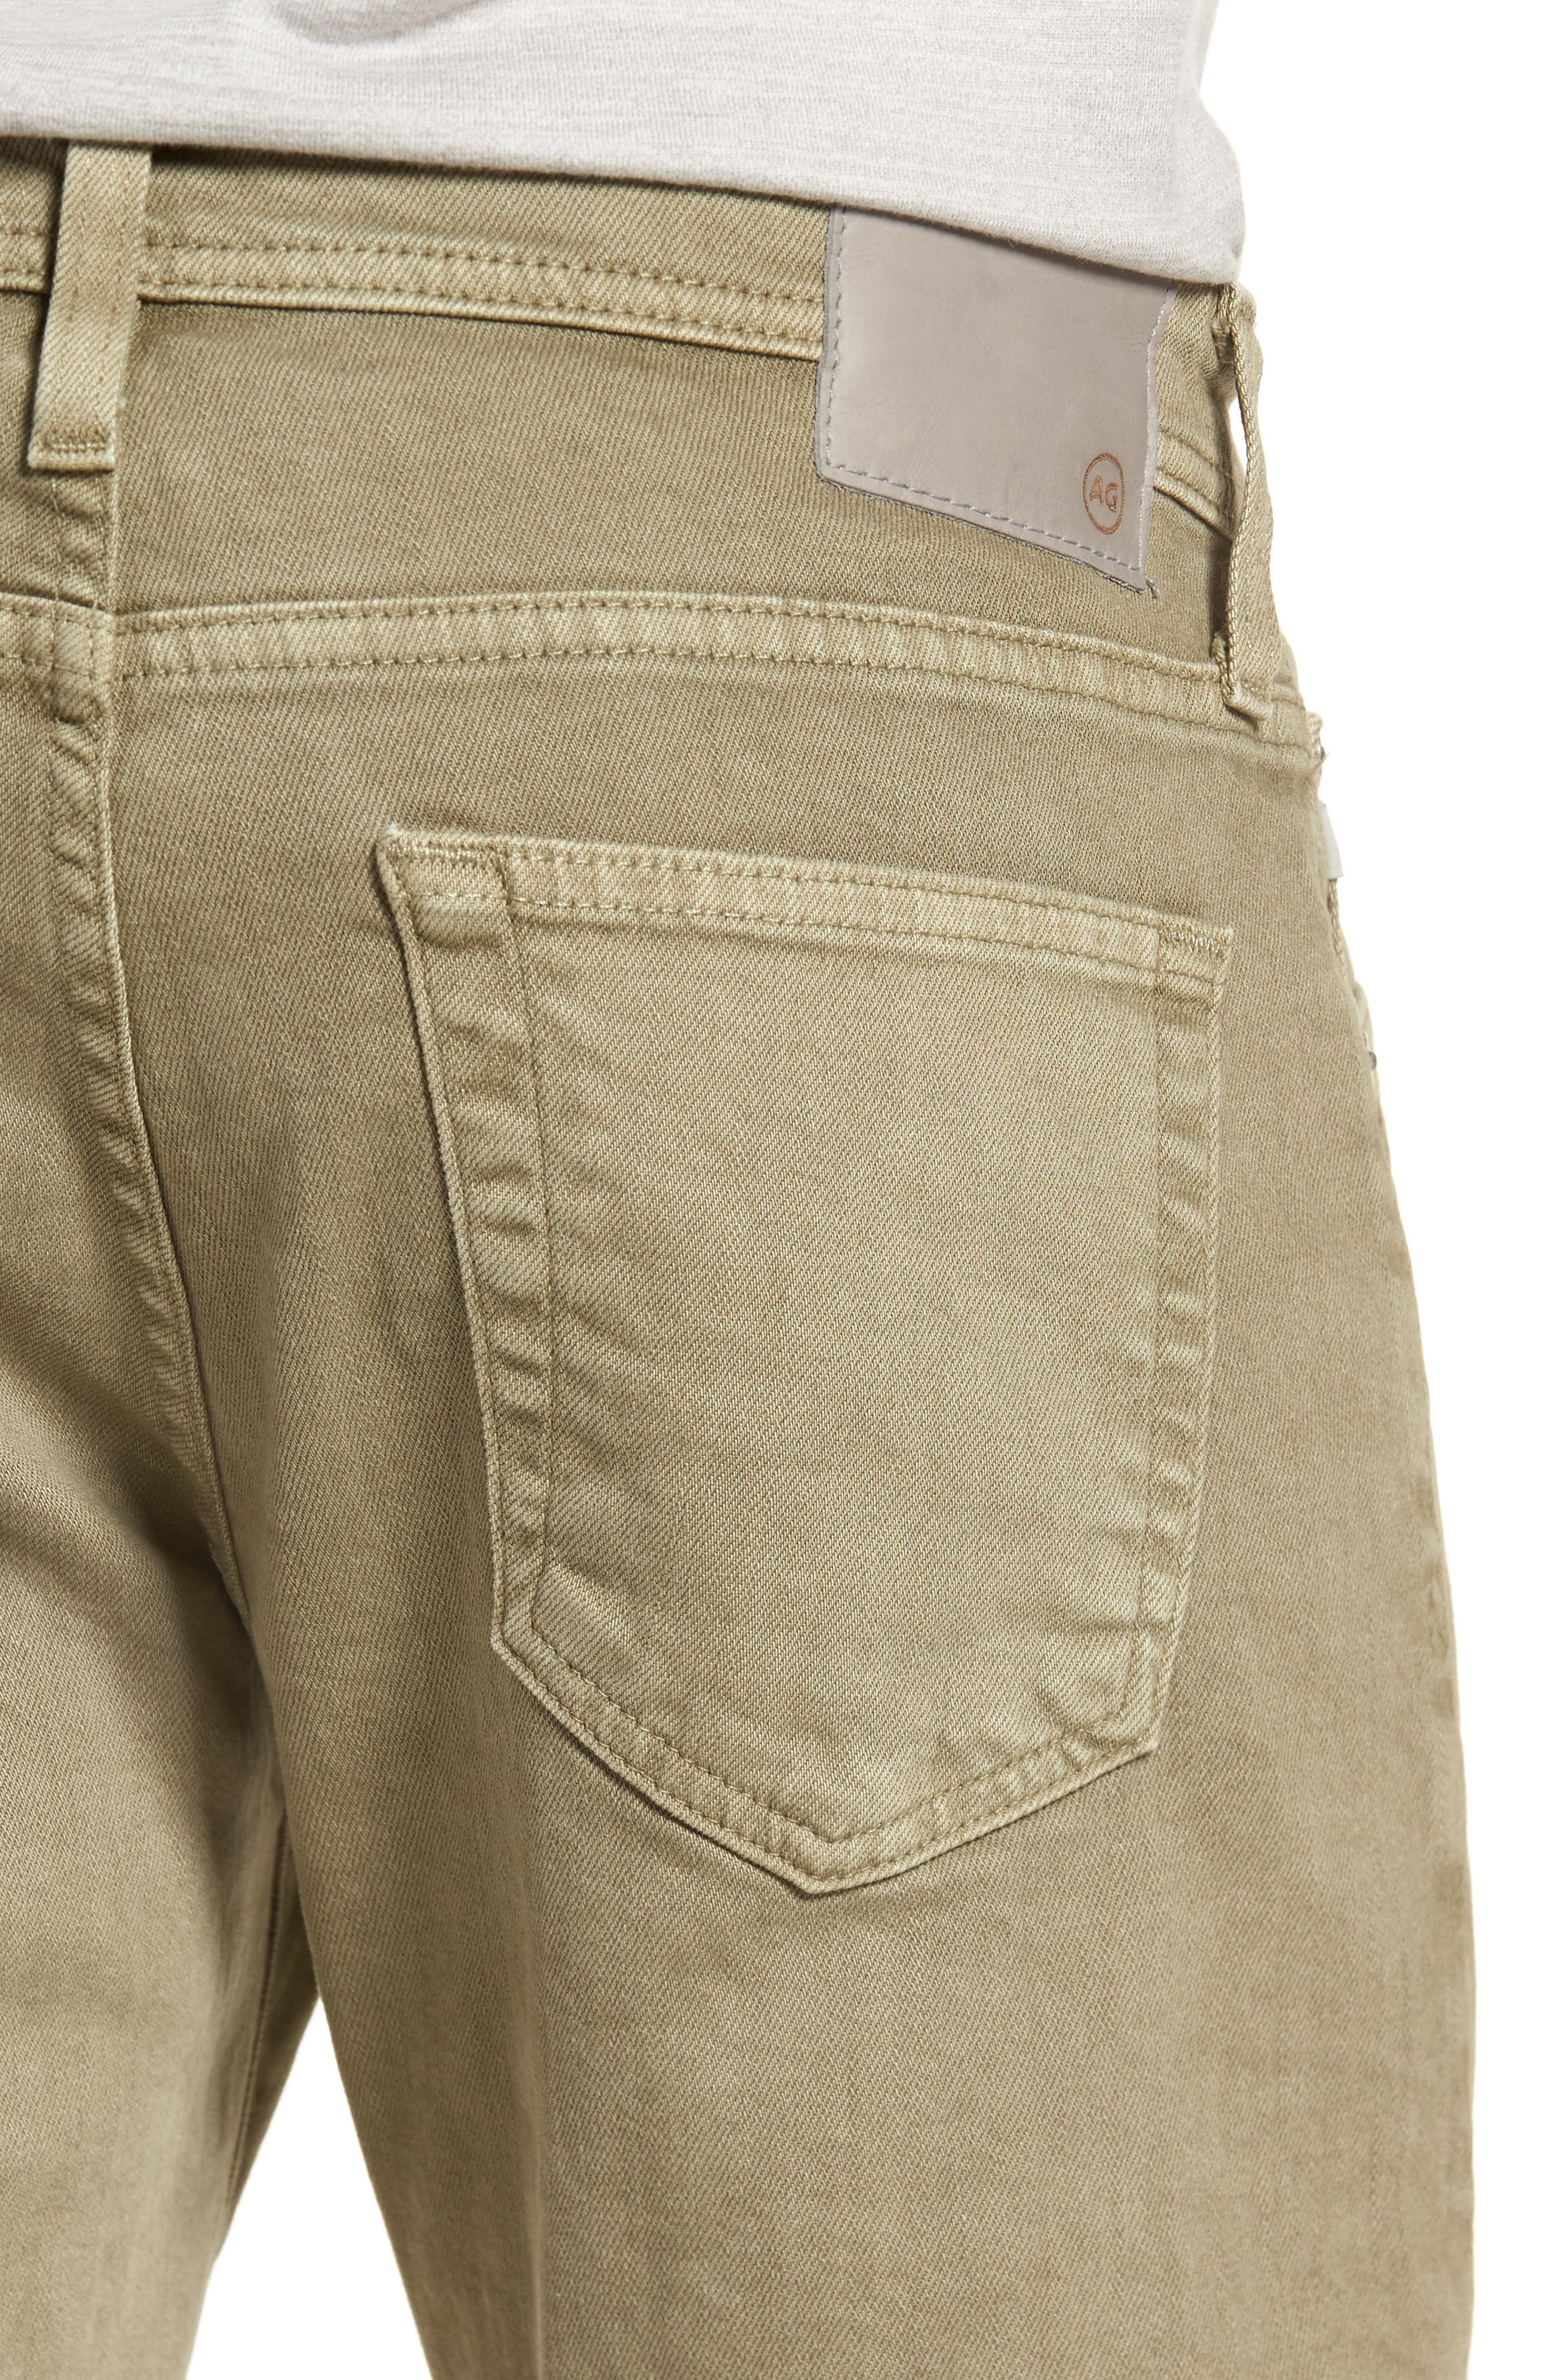 Tellis Slim Fit Jeans,                             Alternate thumbnail 4, color,                             316